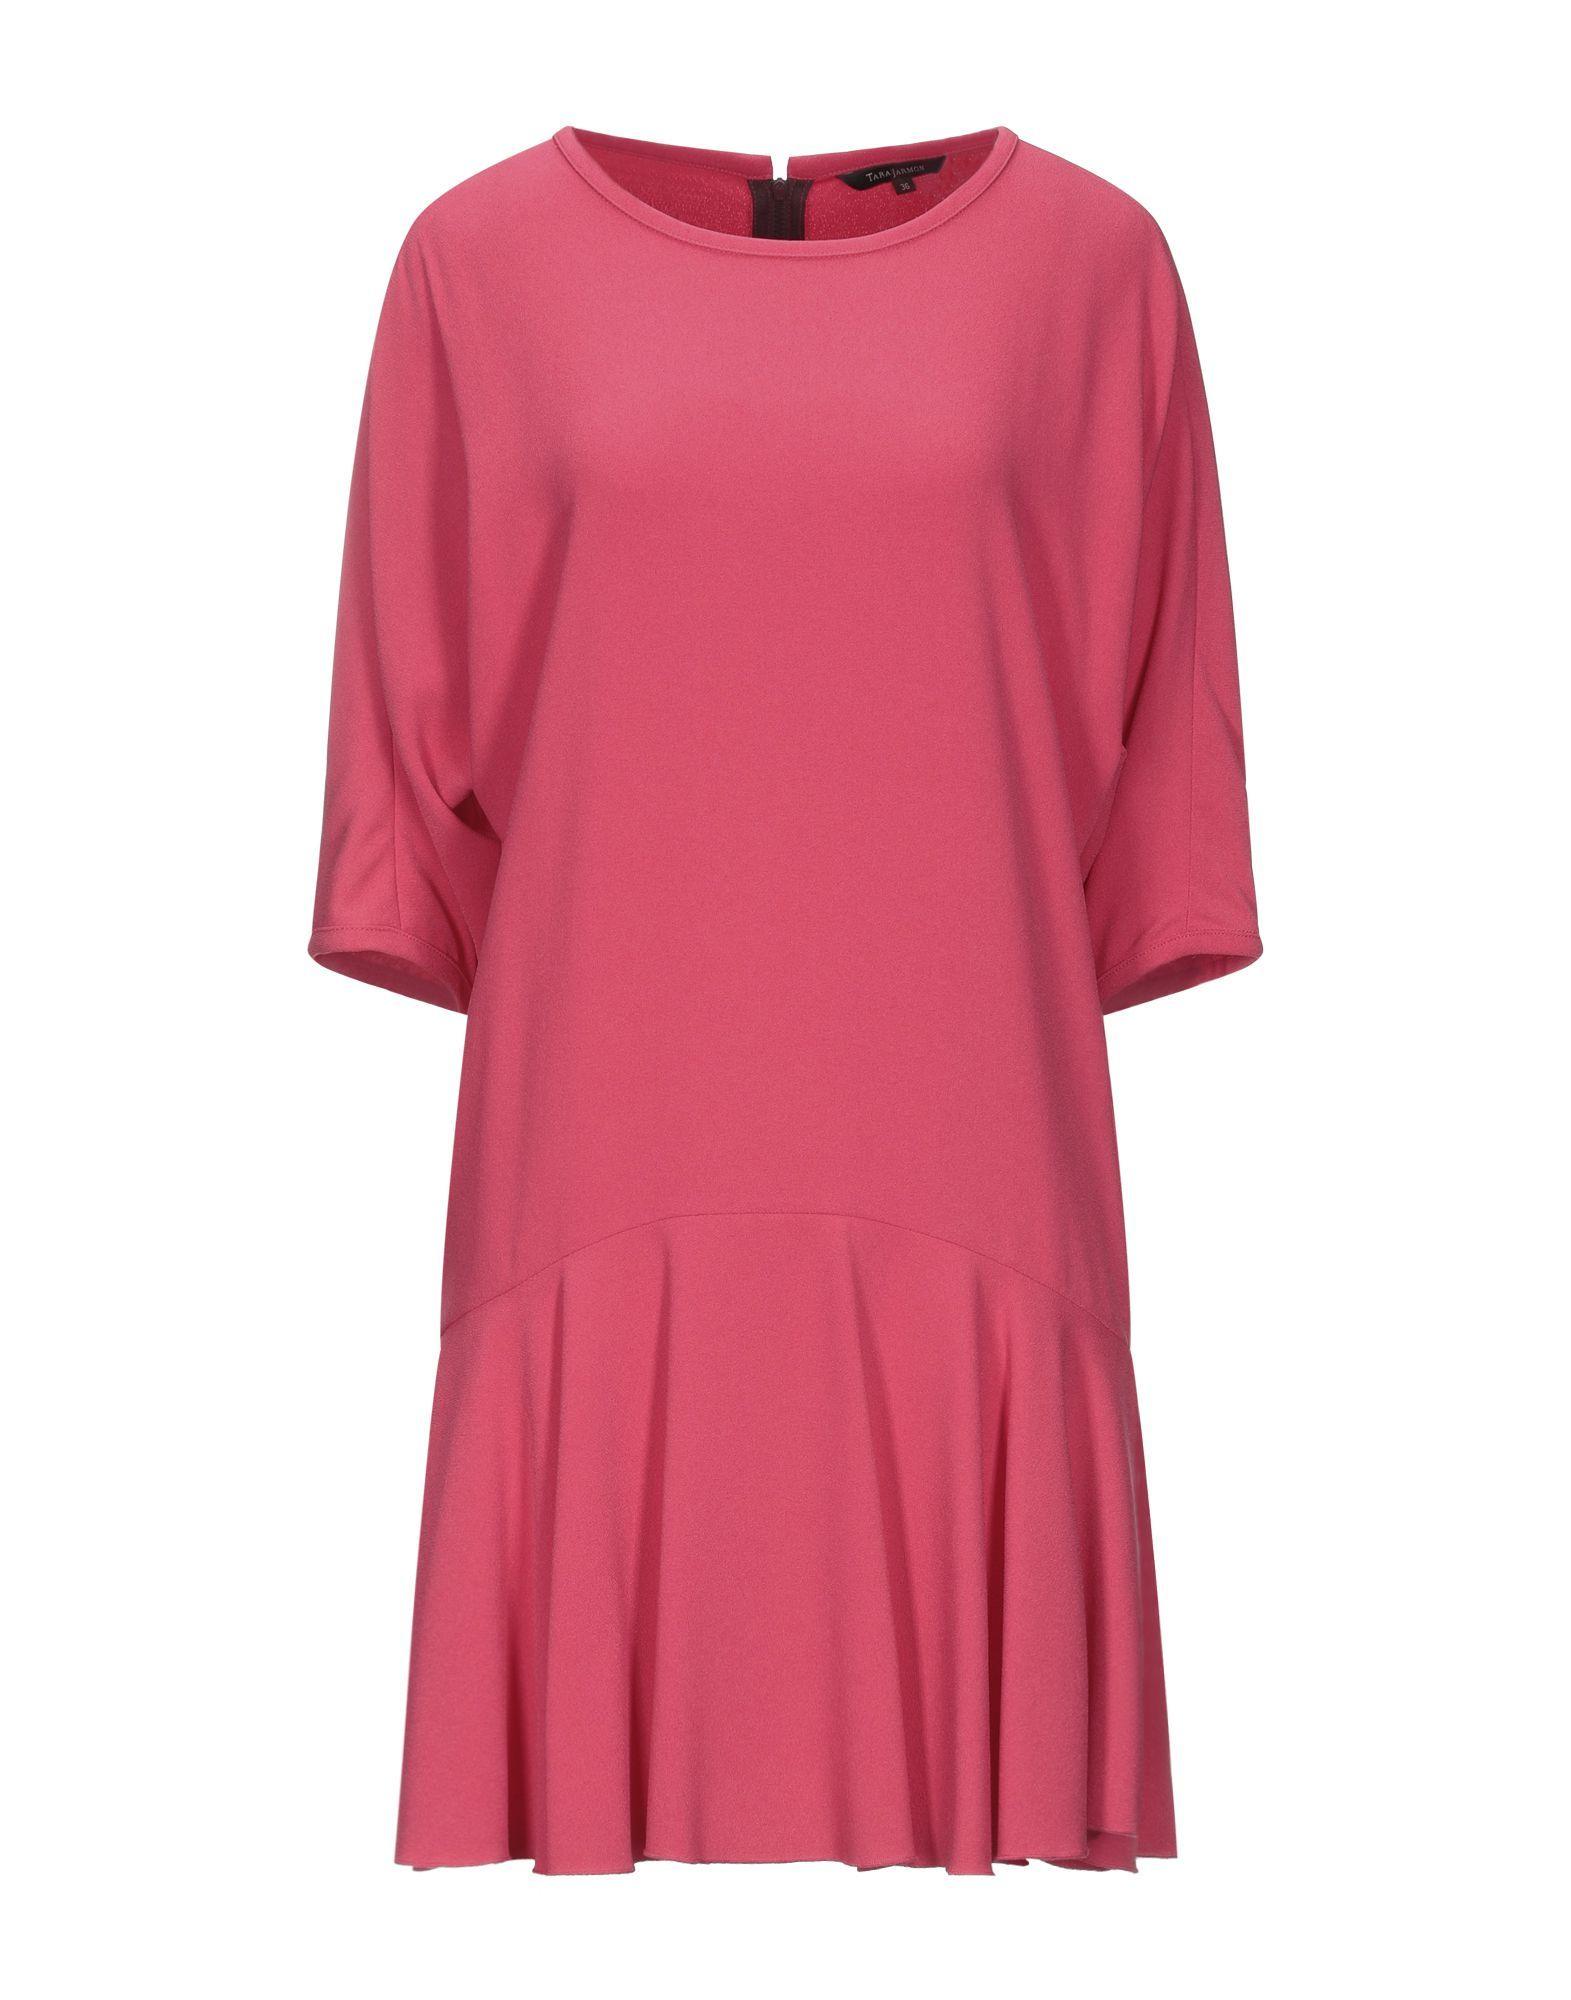 Tara Jarmon Fuchsia Crepe Dress